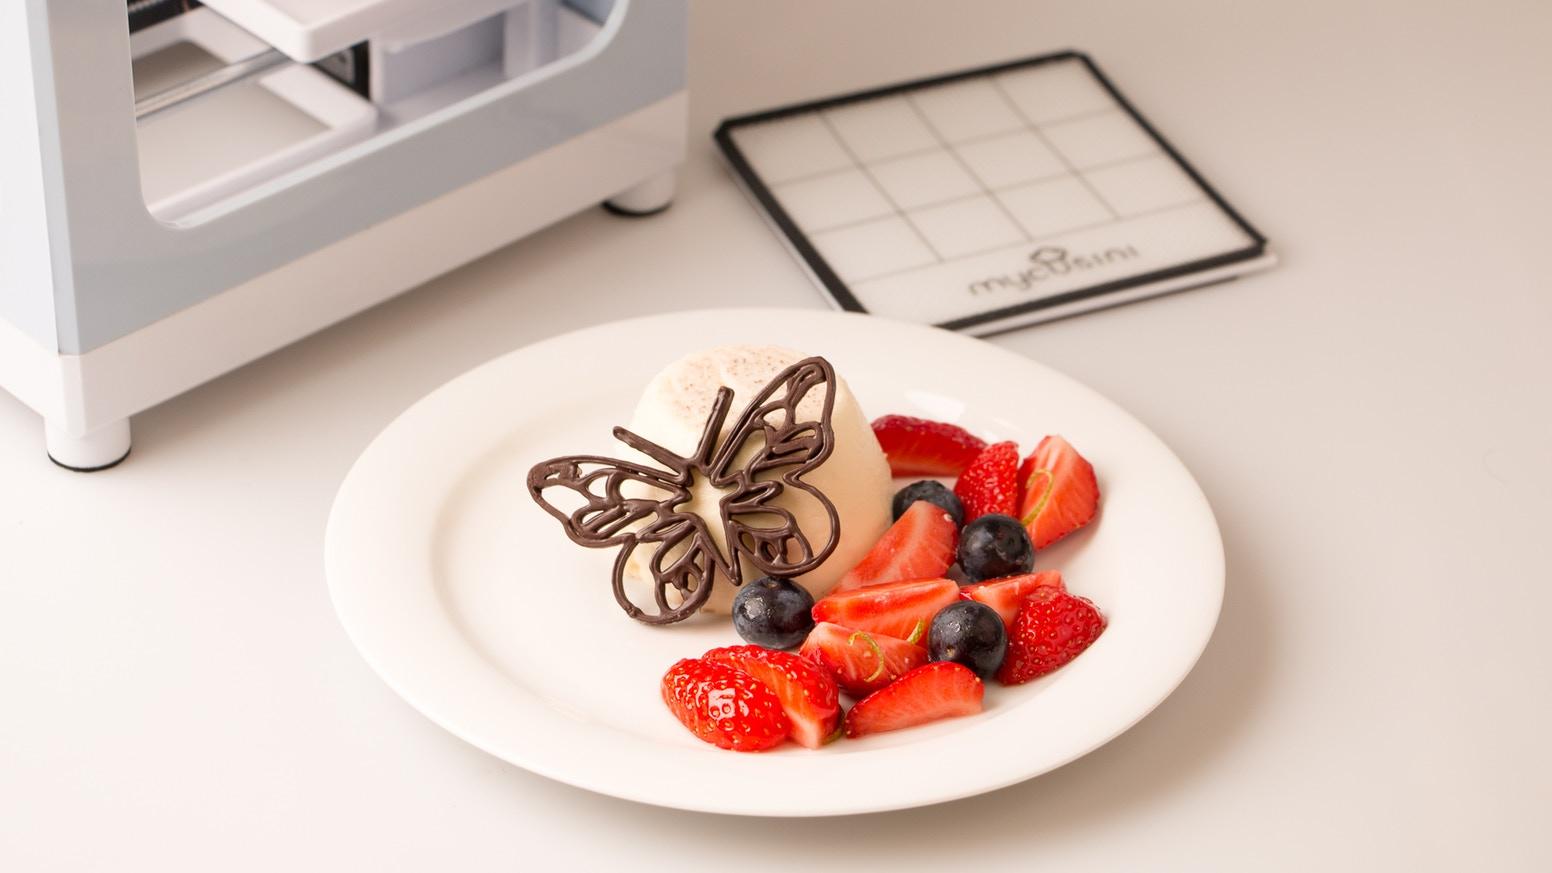 First mycusini 3D Choco printers are shipped already